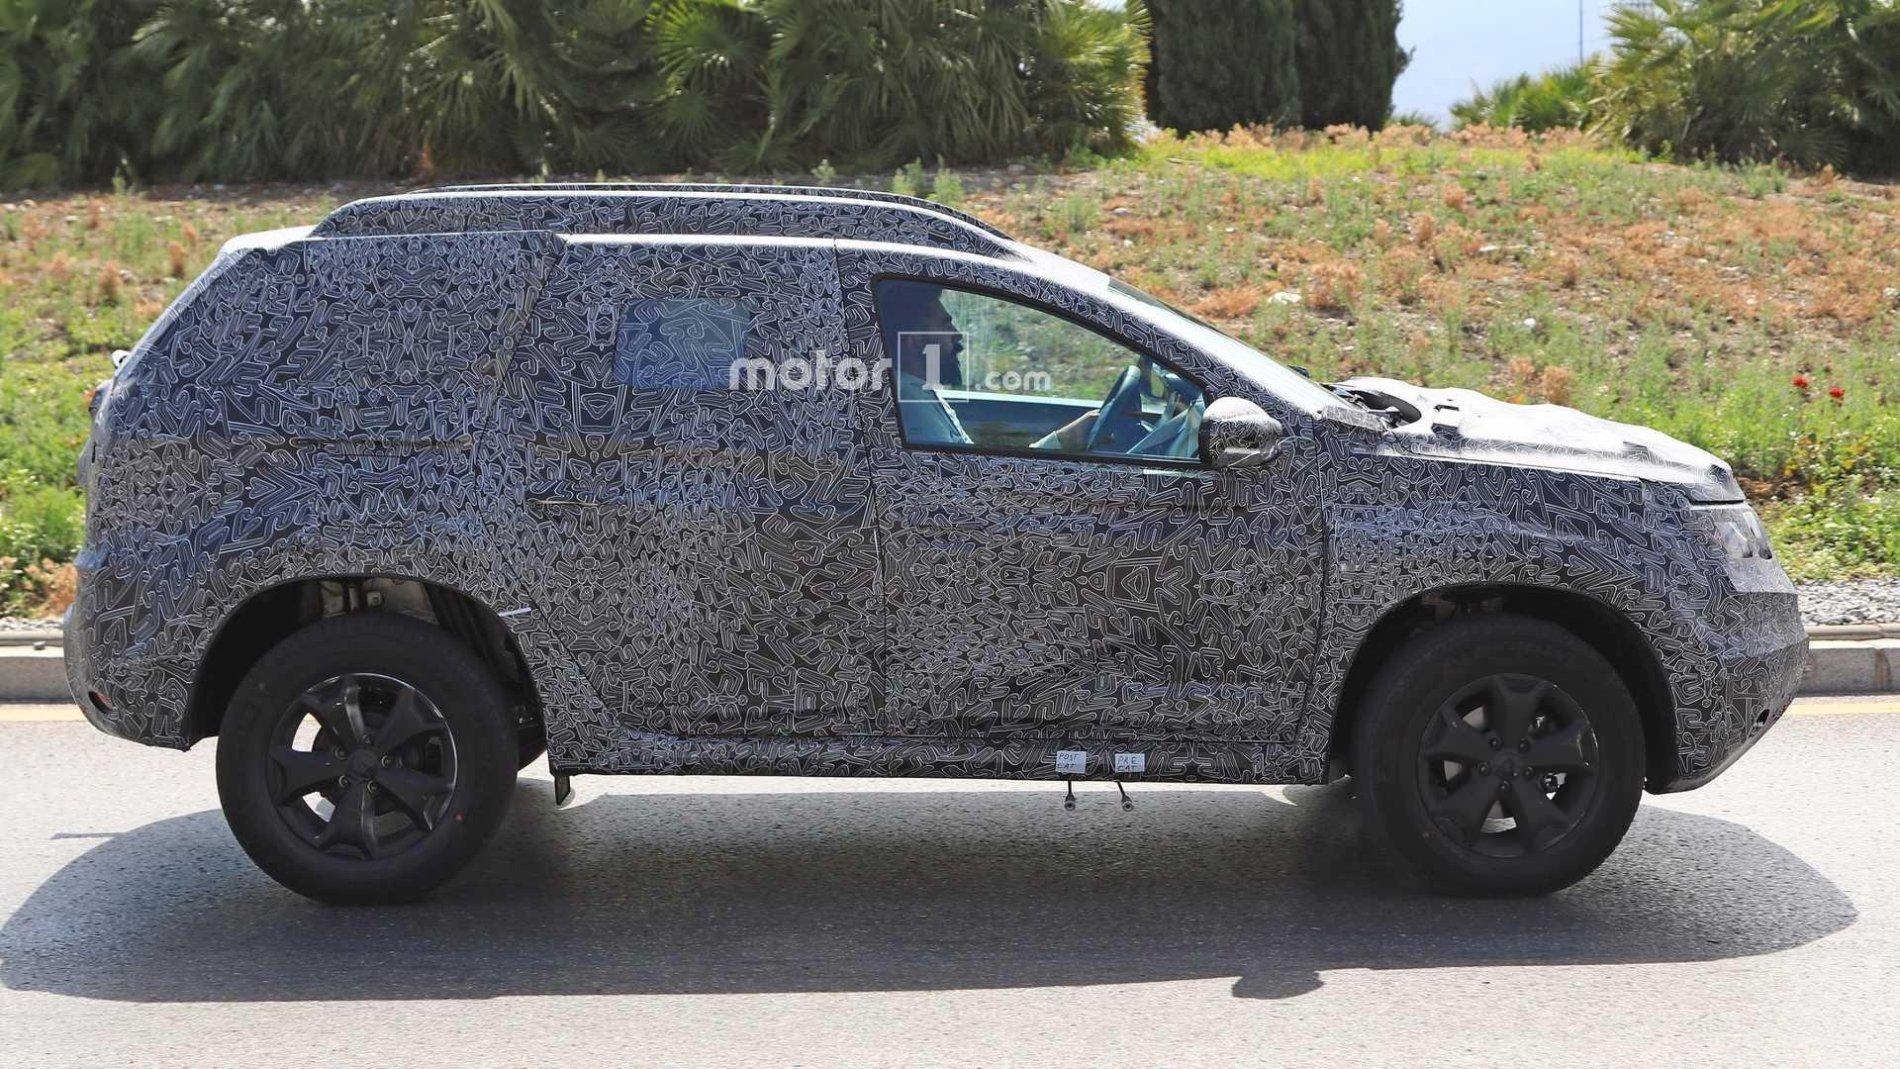 2019 Dacia Duster- poze spion - 2019 Dacia Duster- poze spion